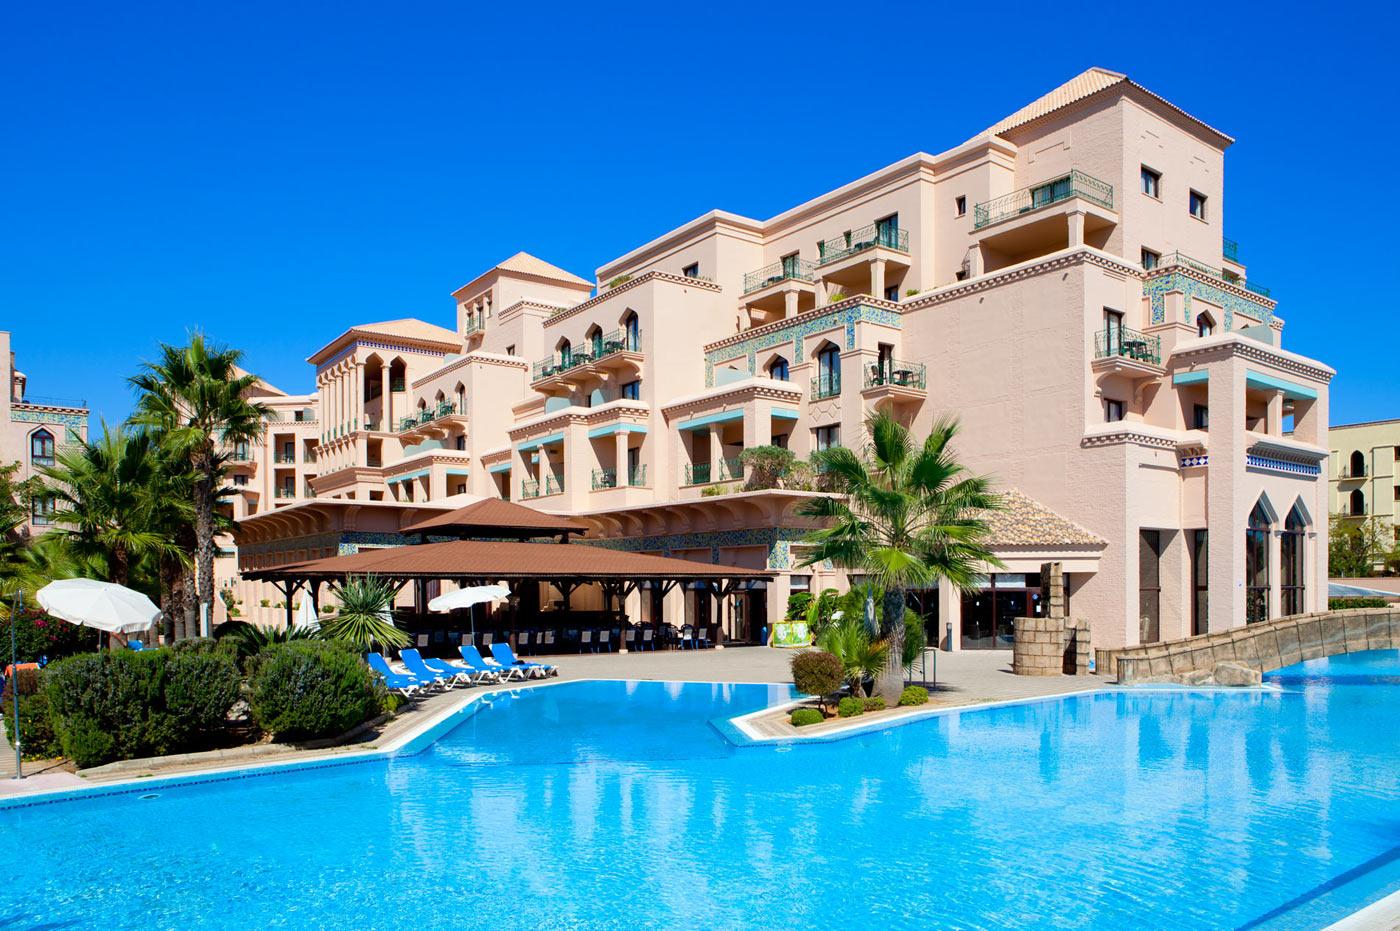 Fachada del hotel junto a la piscina